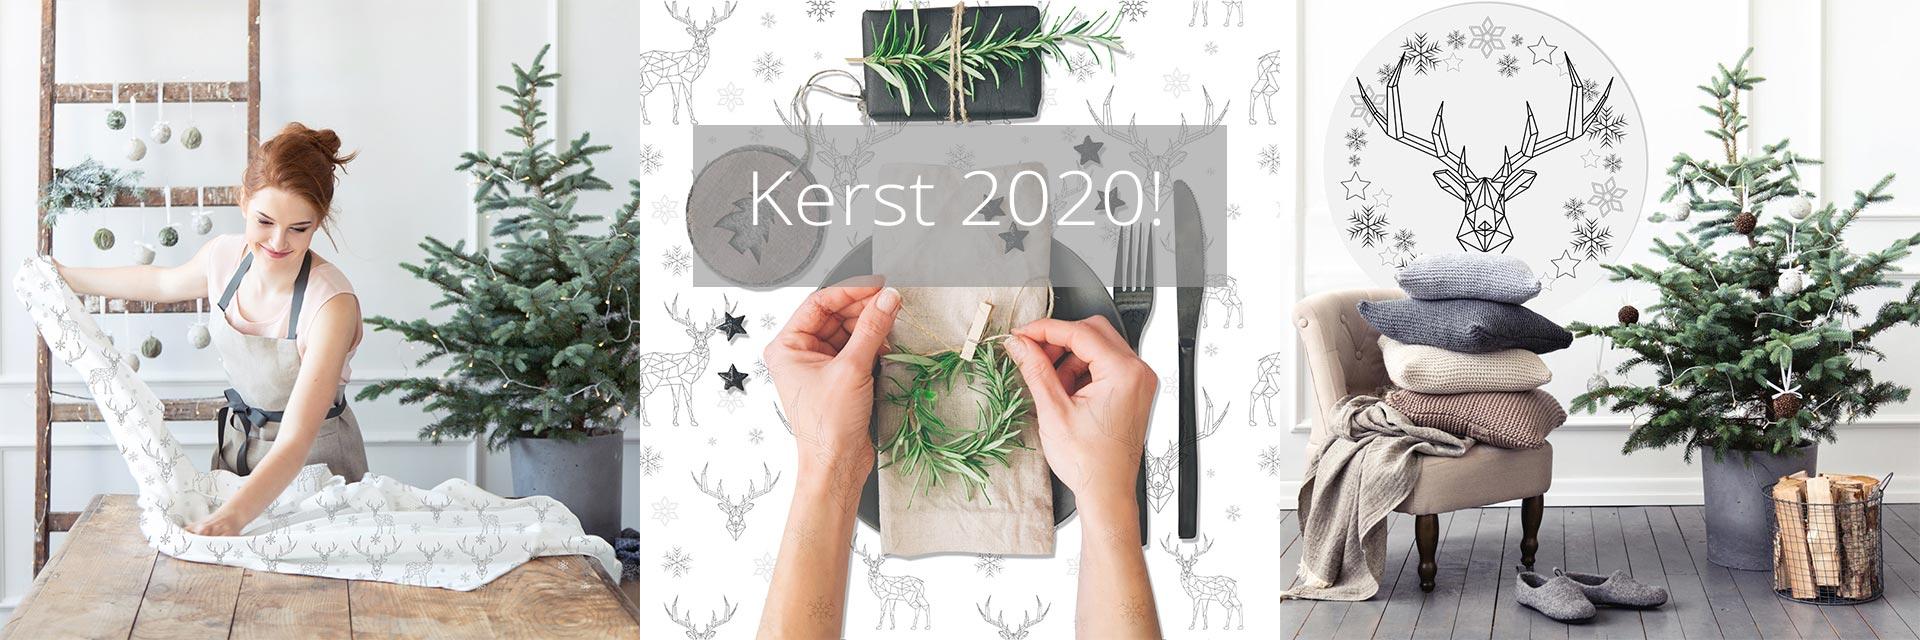 kerstdecoratie 2020